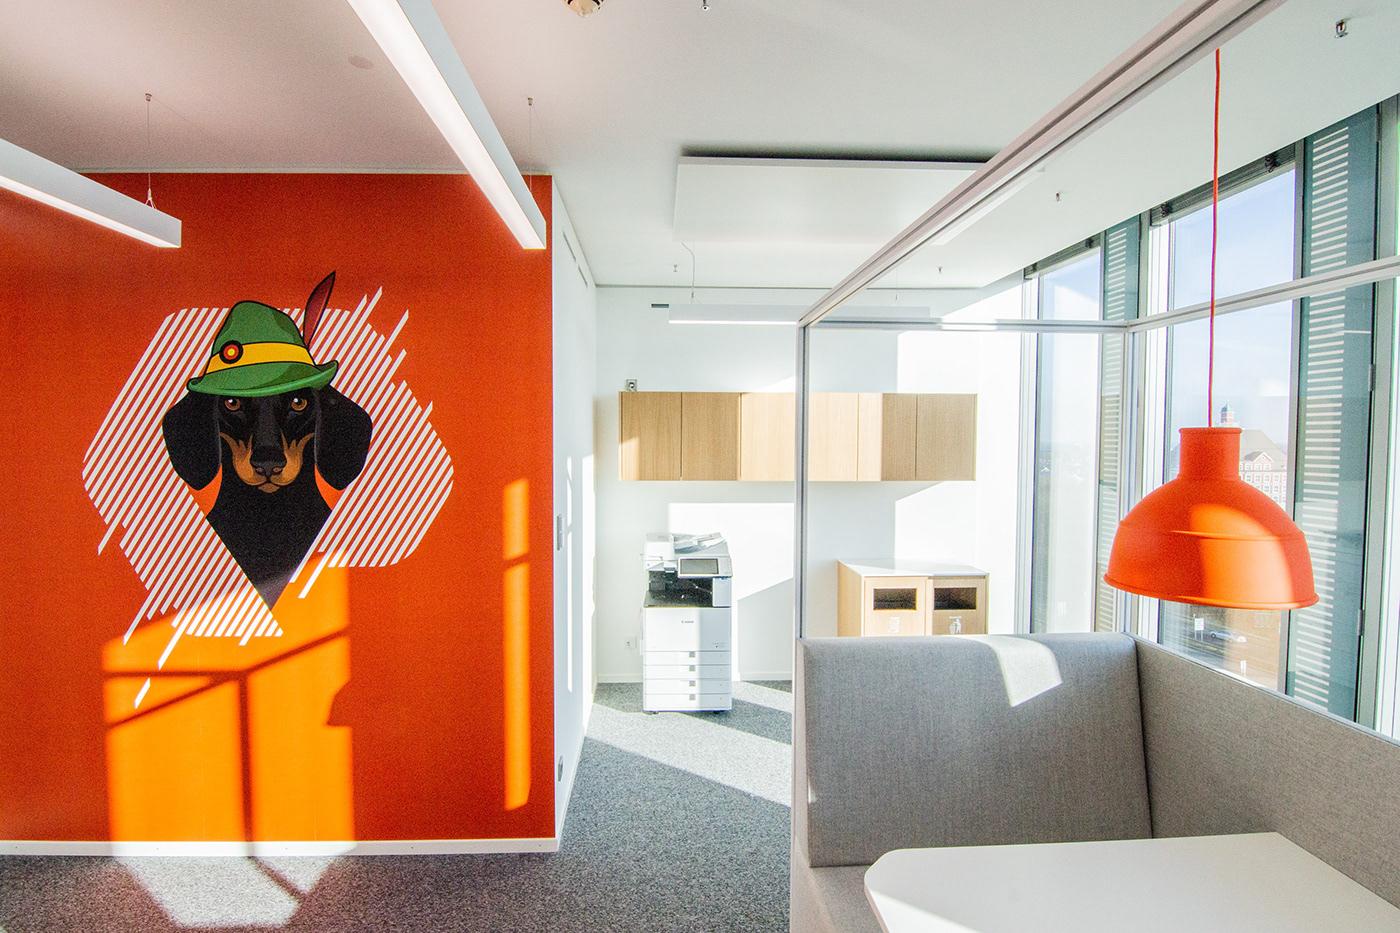 architecture brand guidelines branding  environmental graphics Experiential design identity ILLUSTRATION  inplacedesign interiordesign PureStorage